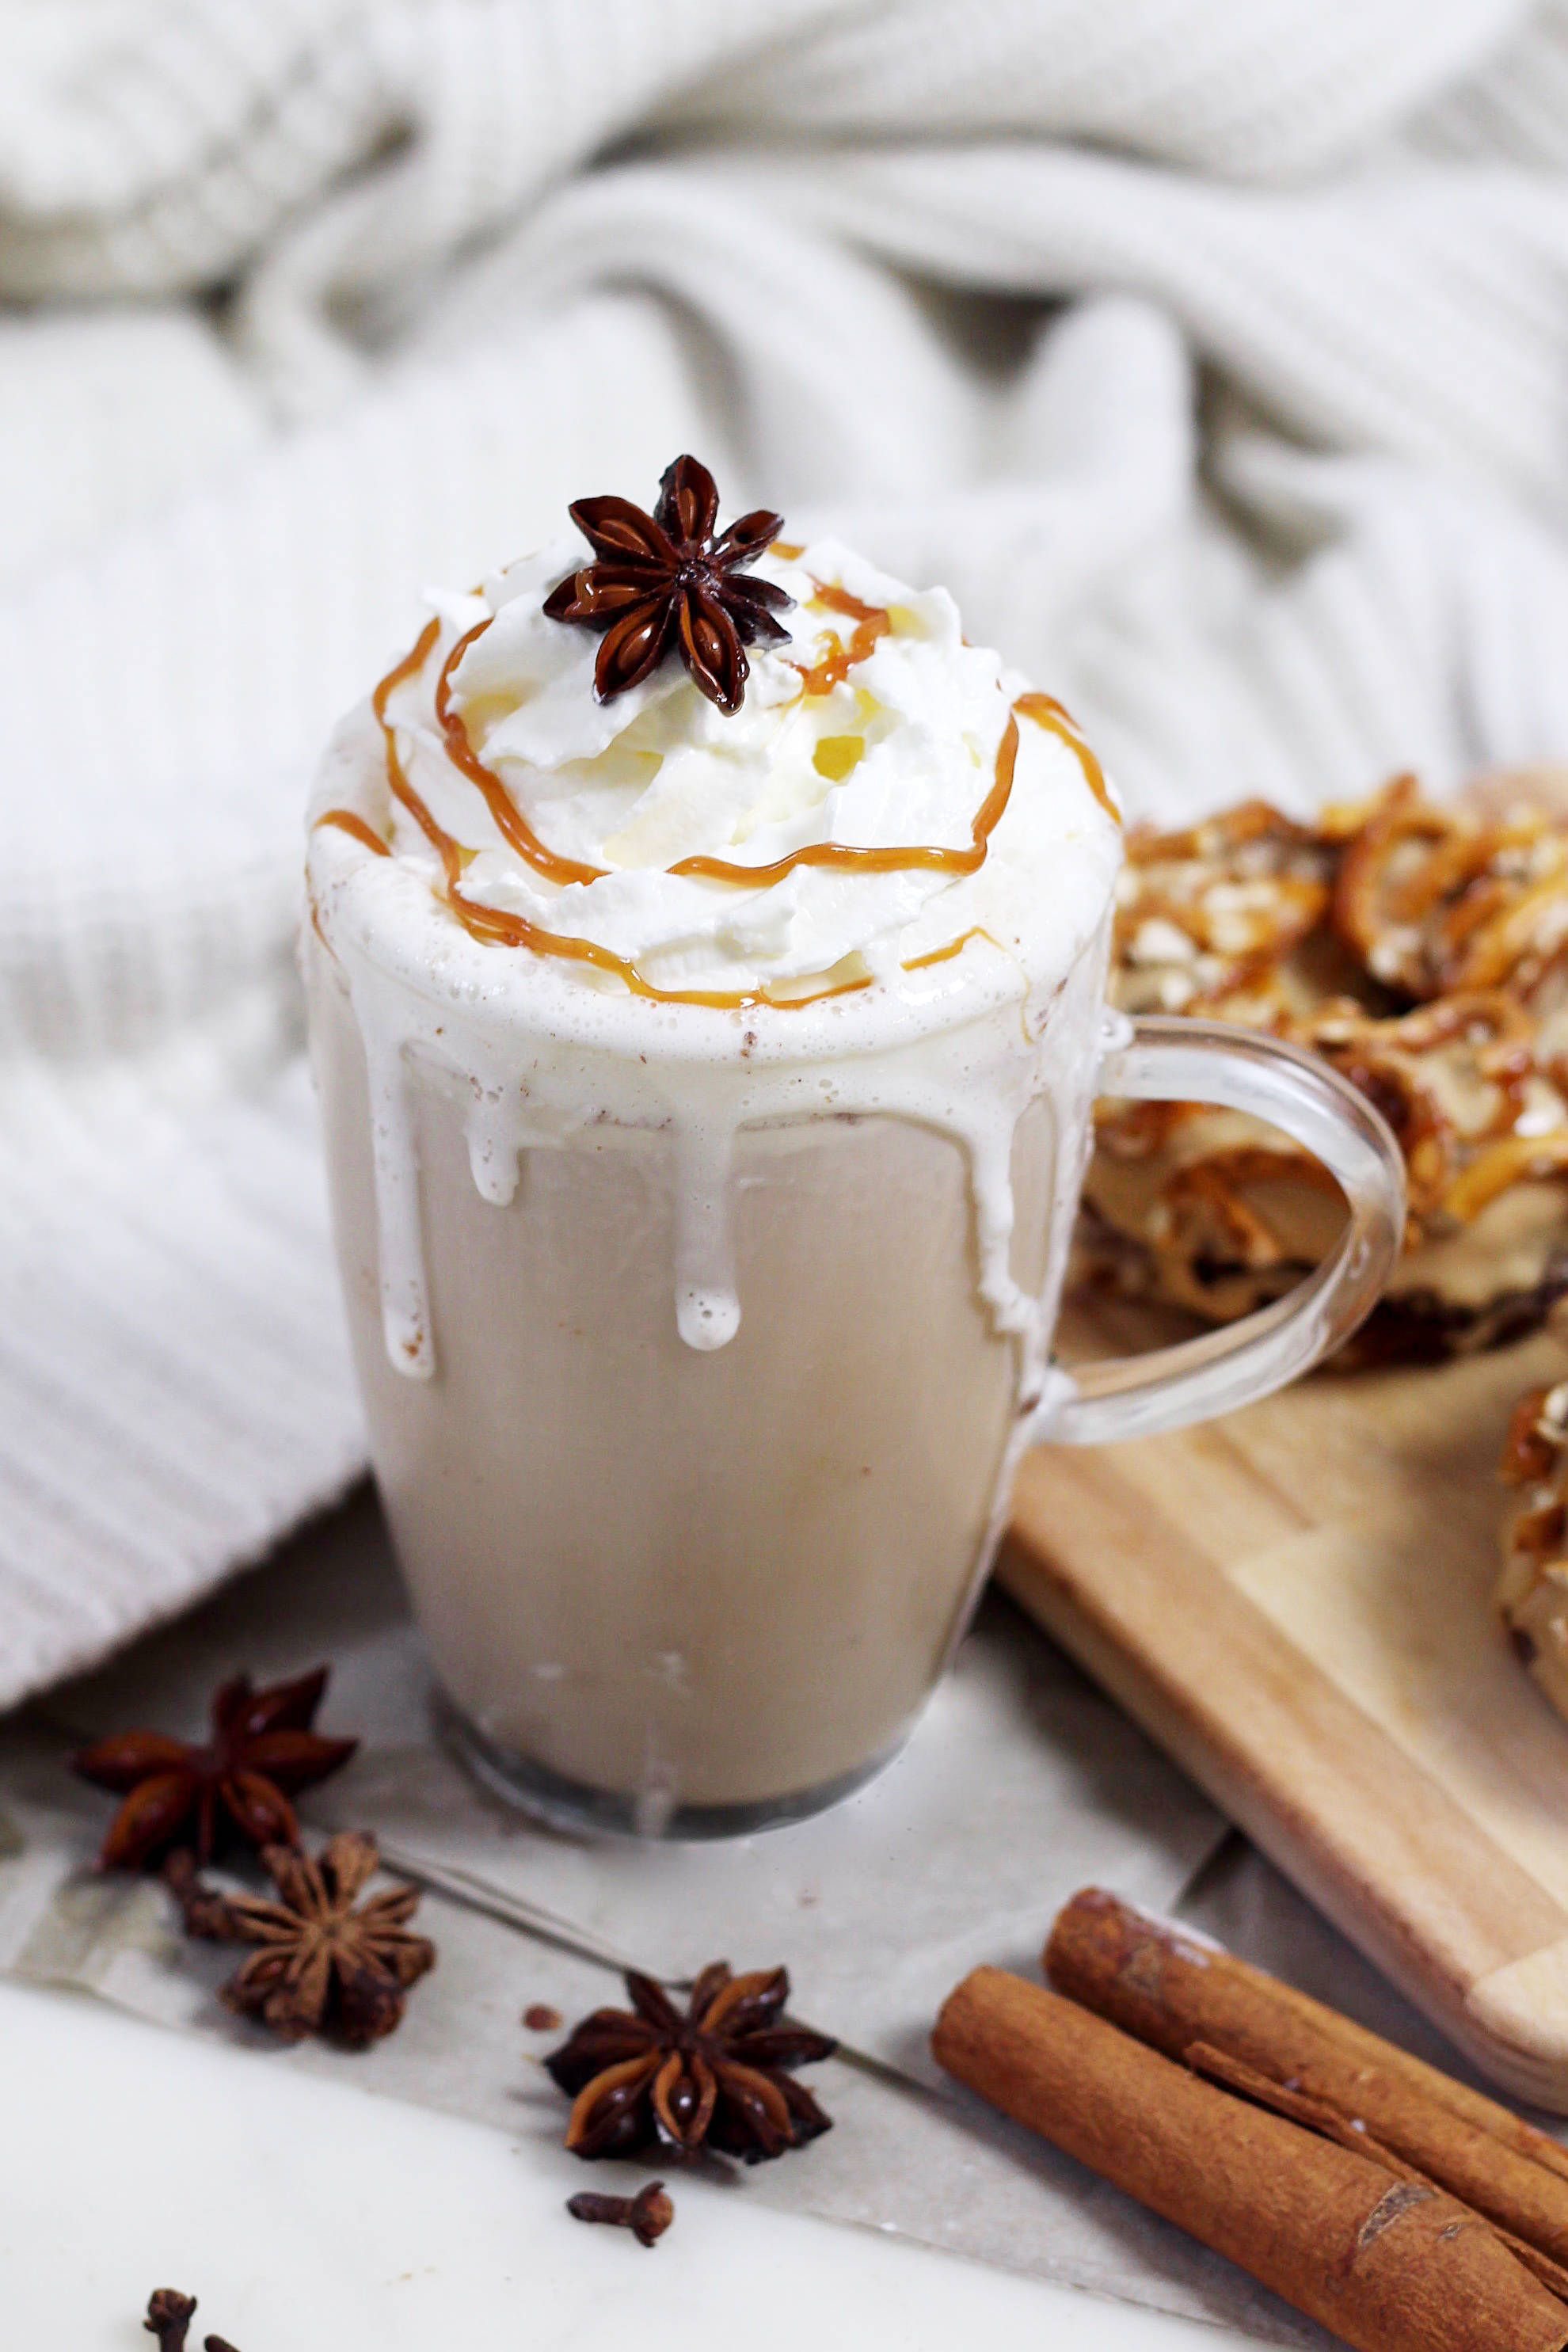 Chai Latte Selber Machen Das Ultimative Winter Rezept Winterrezepte Chai Tee Rezept Und Lecker